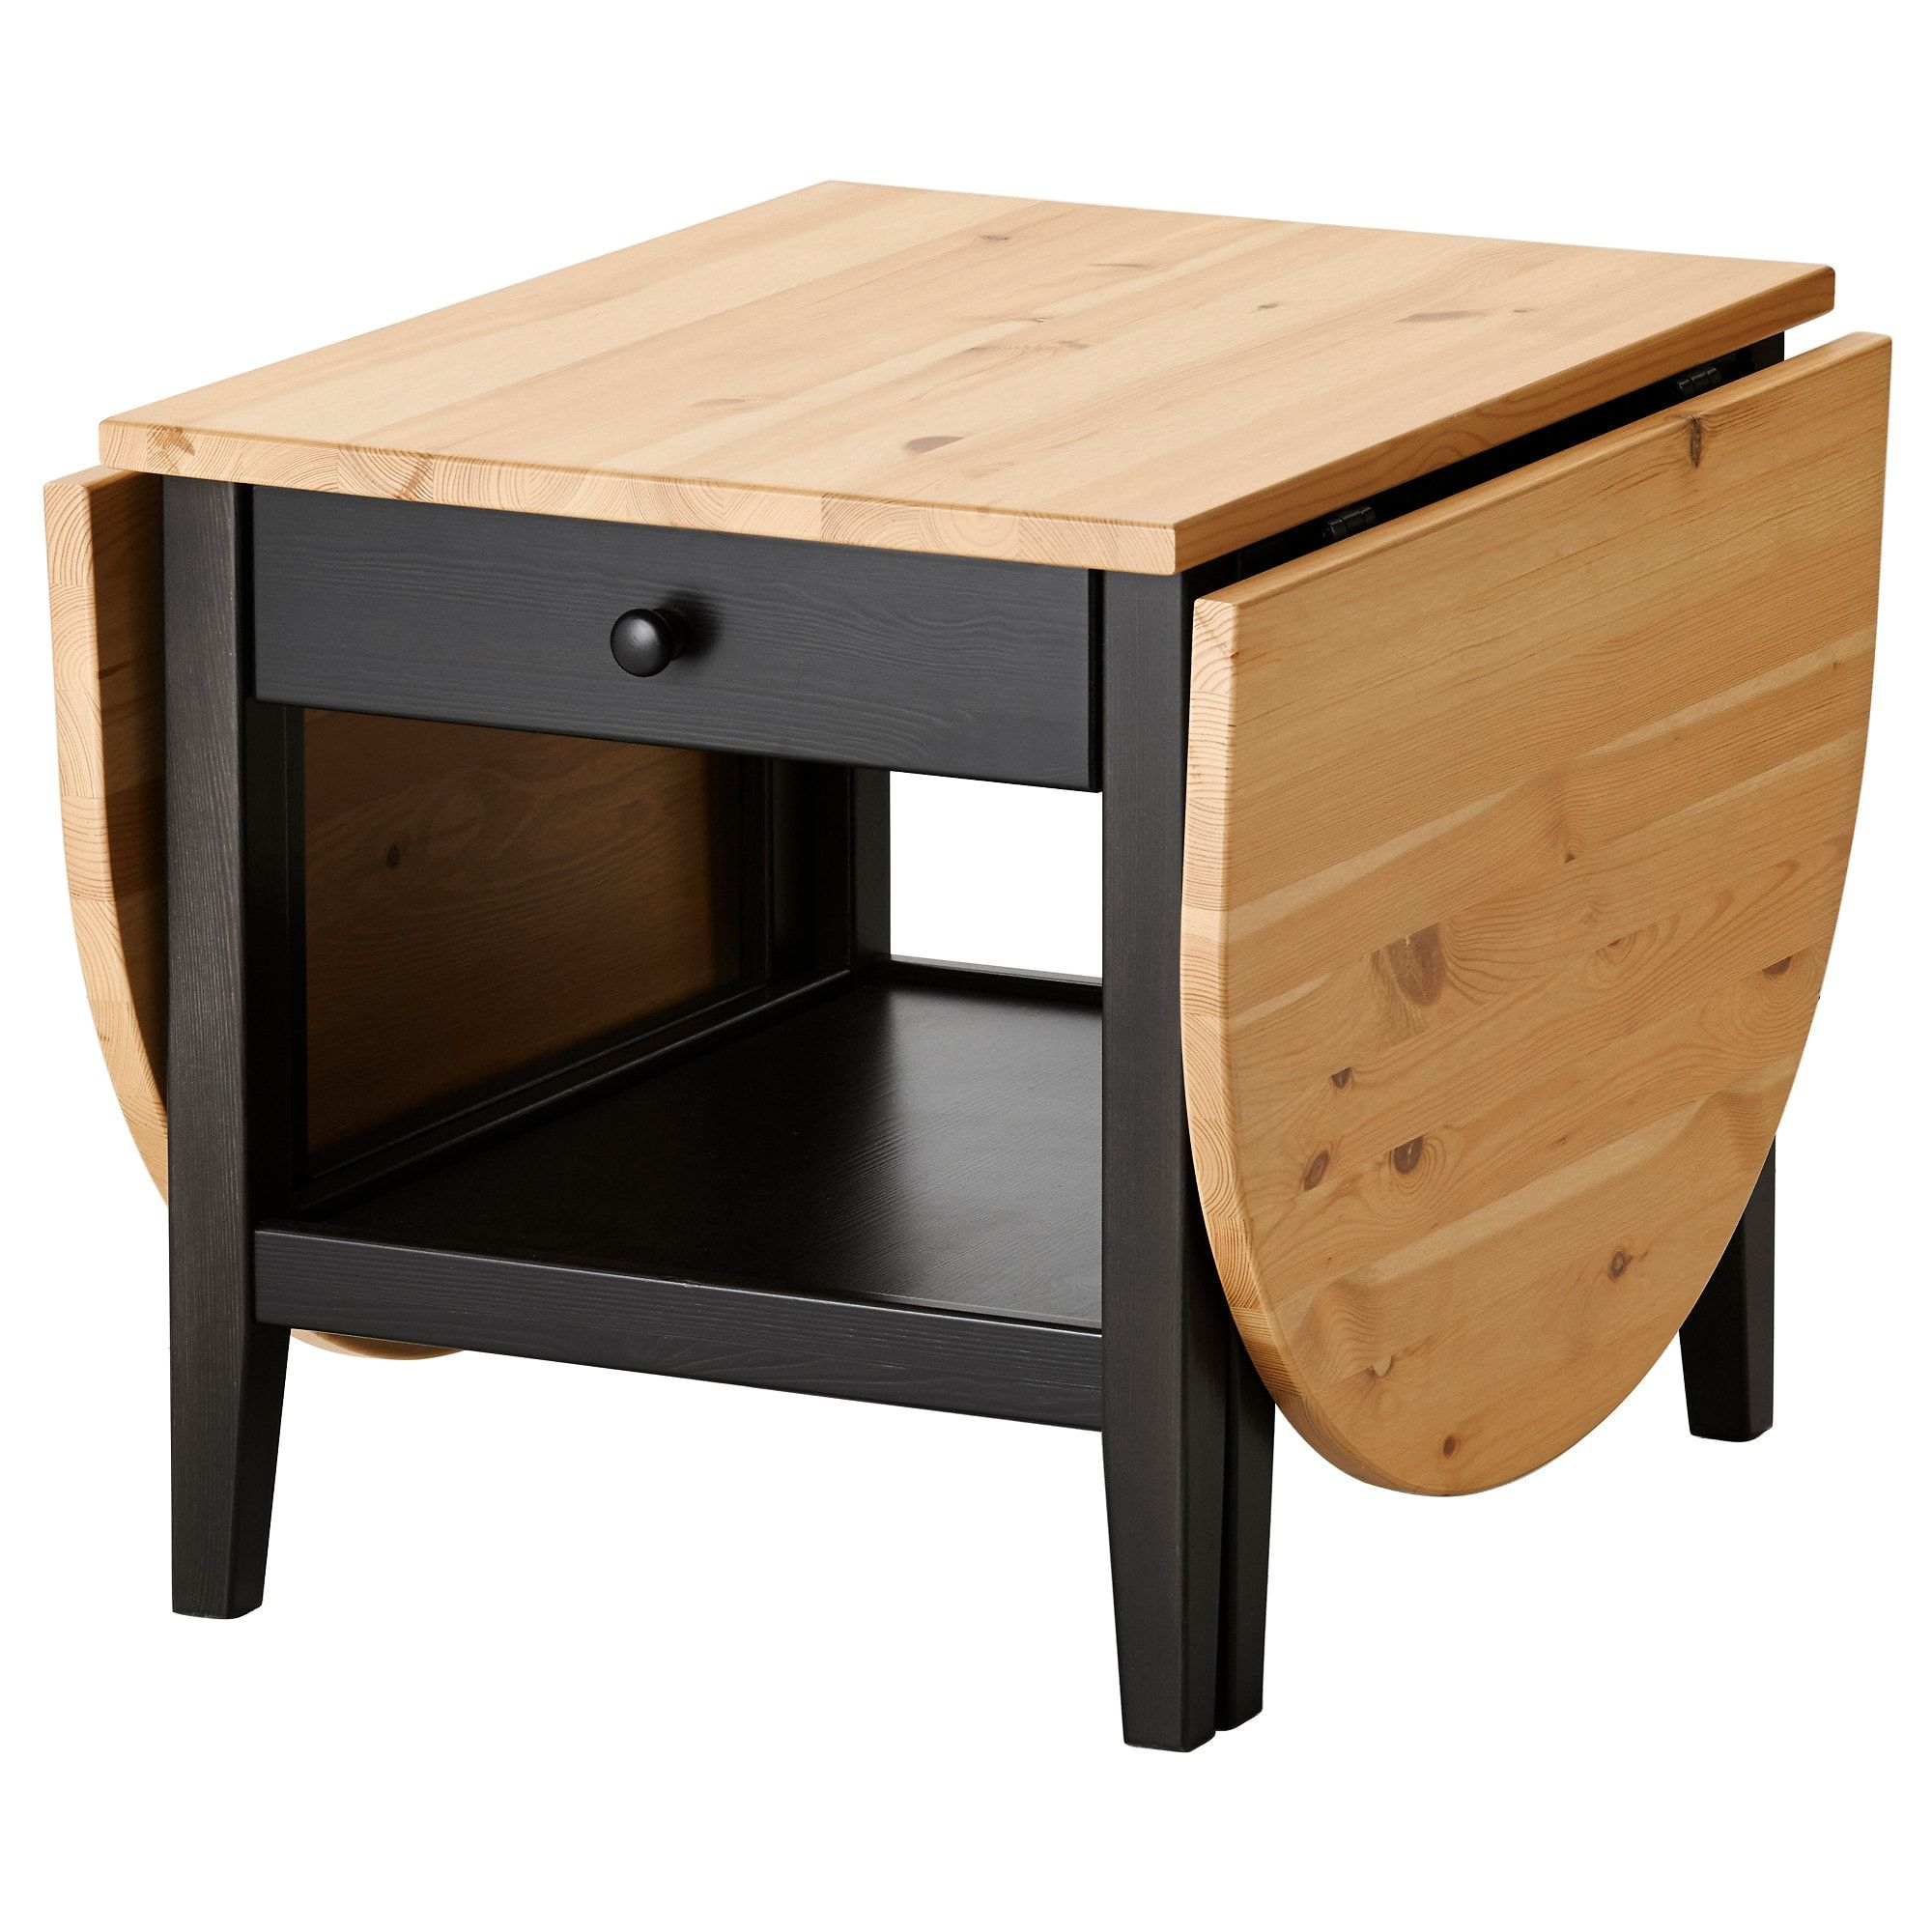 Ikea Arkelstorp Black Coffee Table | Ikea Coffee Table ... pour Table Basse De Jardin Ikea